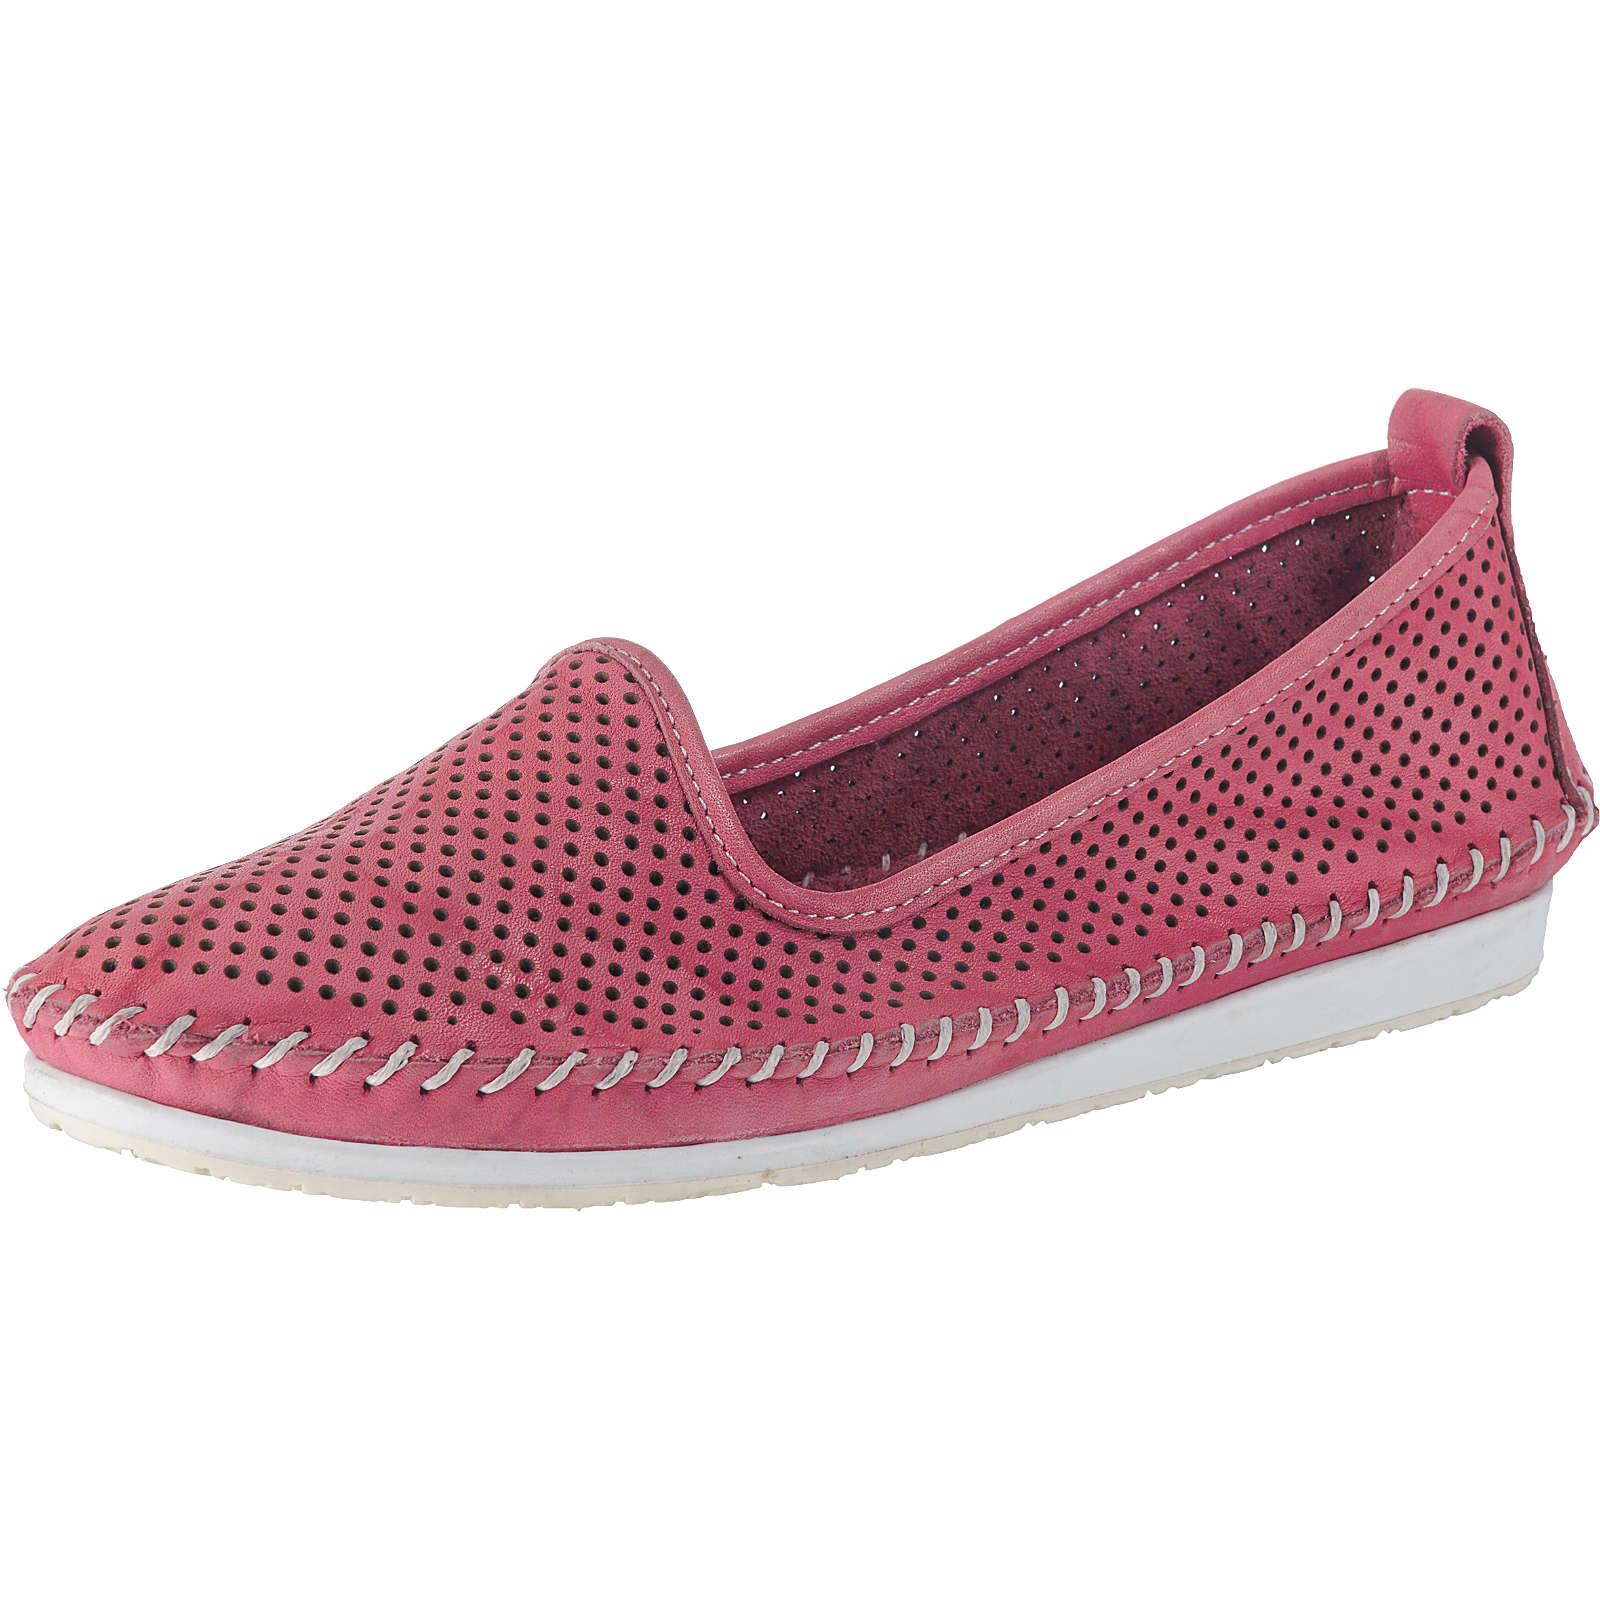 Andrea Conti Klassische Slipper pink Damen Gr. 42 jetztbilligerkaufen